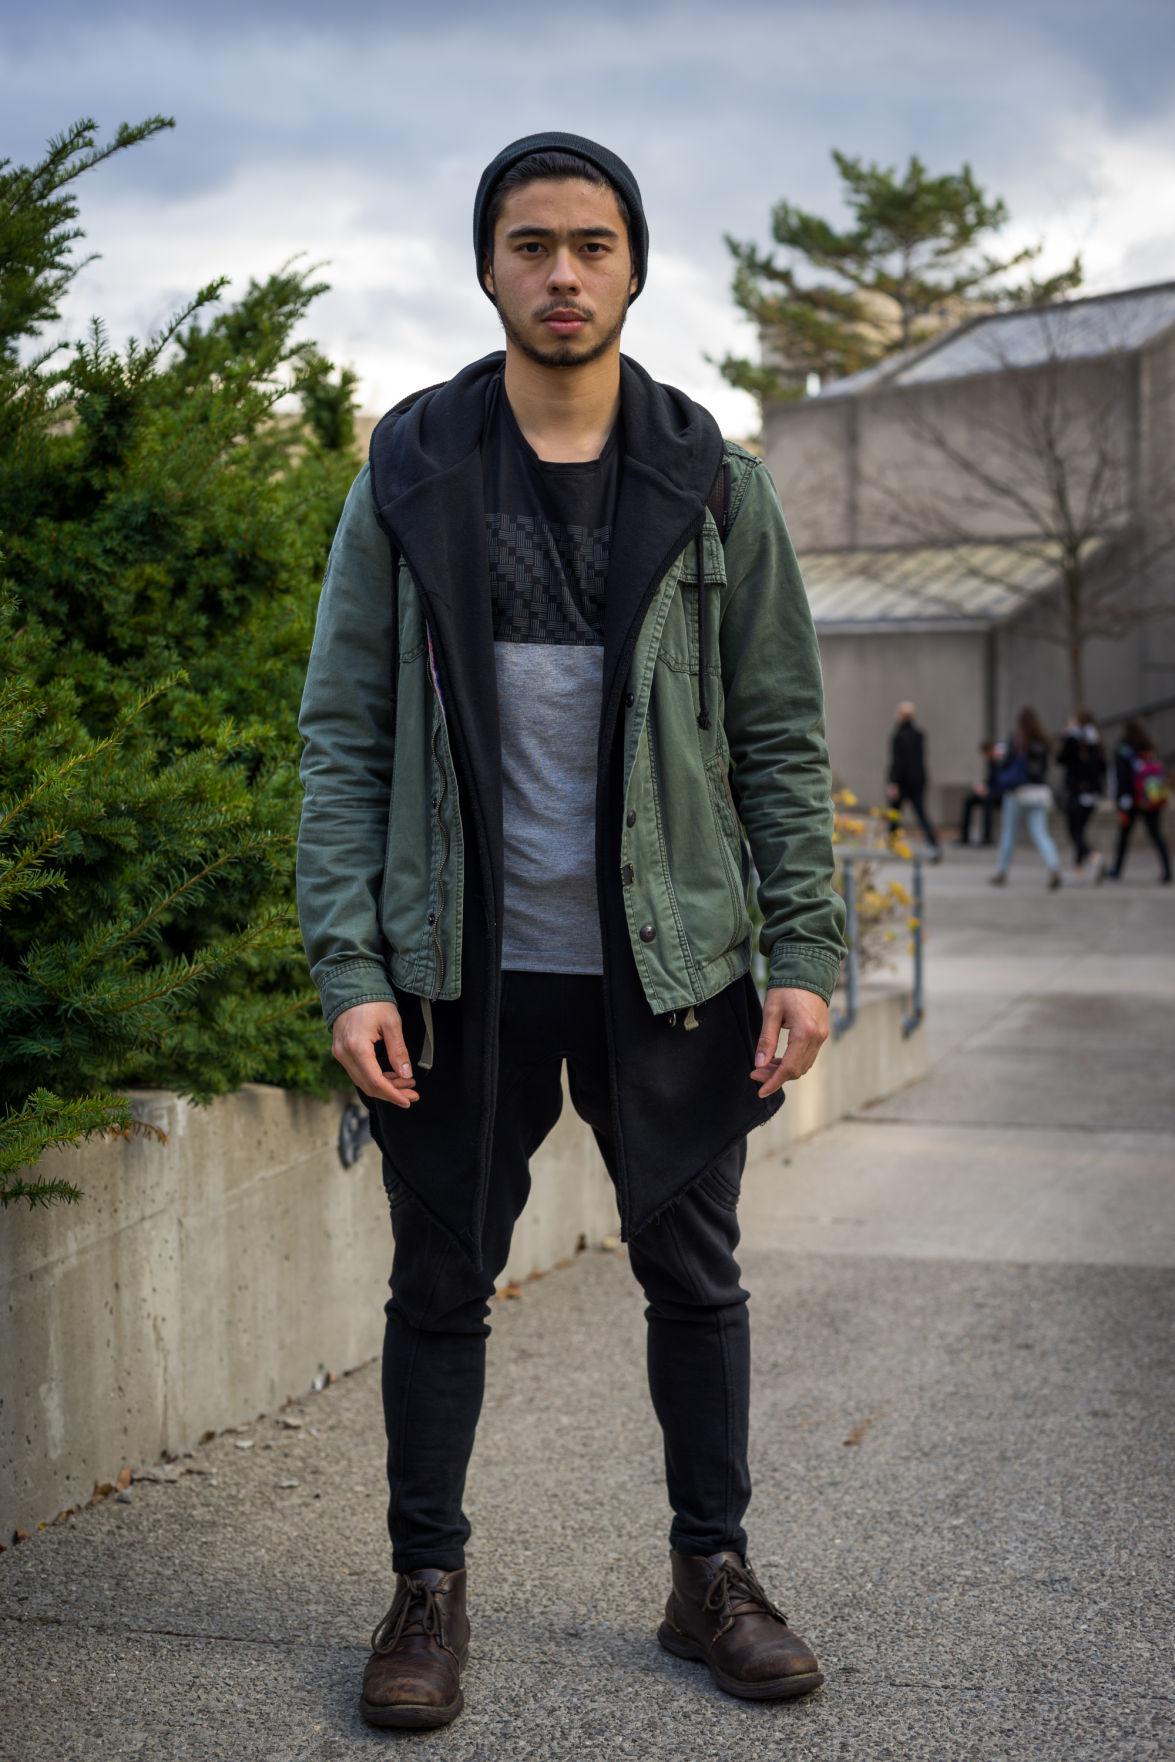 Fashion Forward spenser raposo